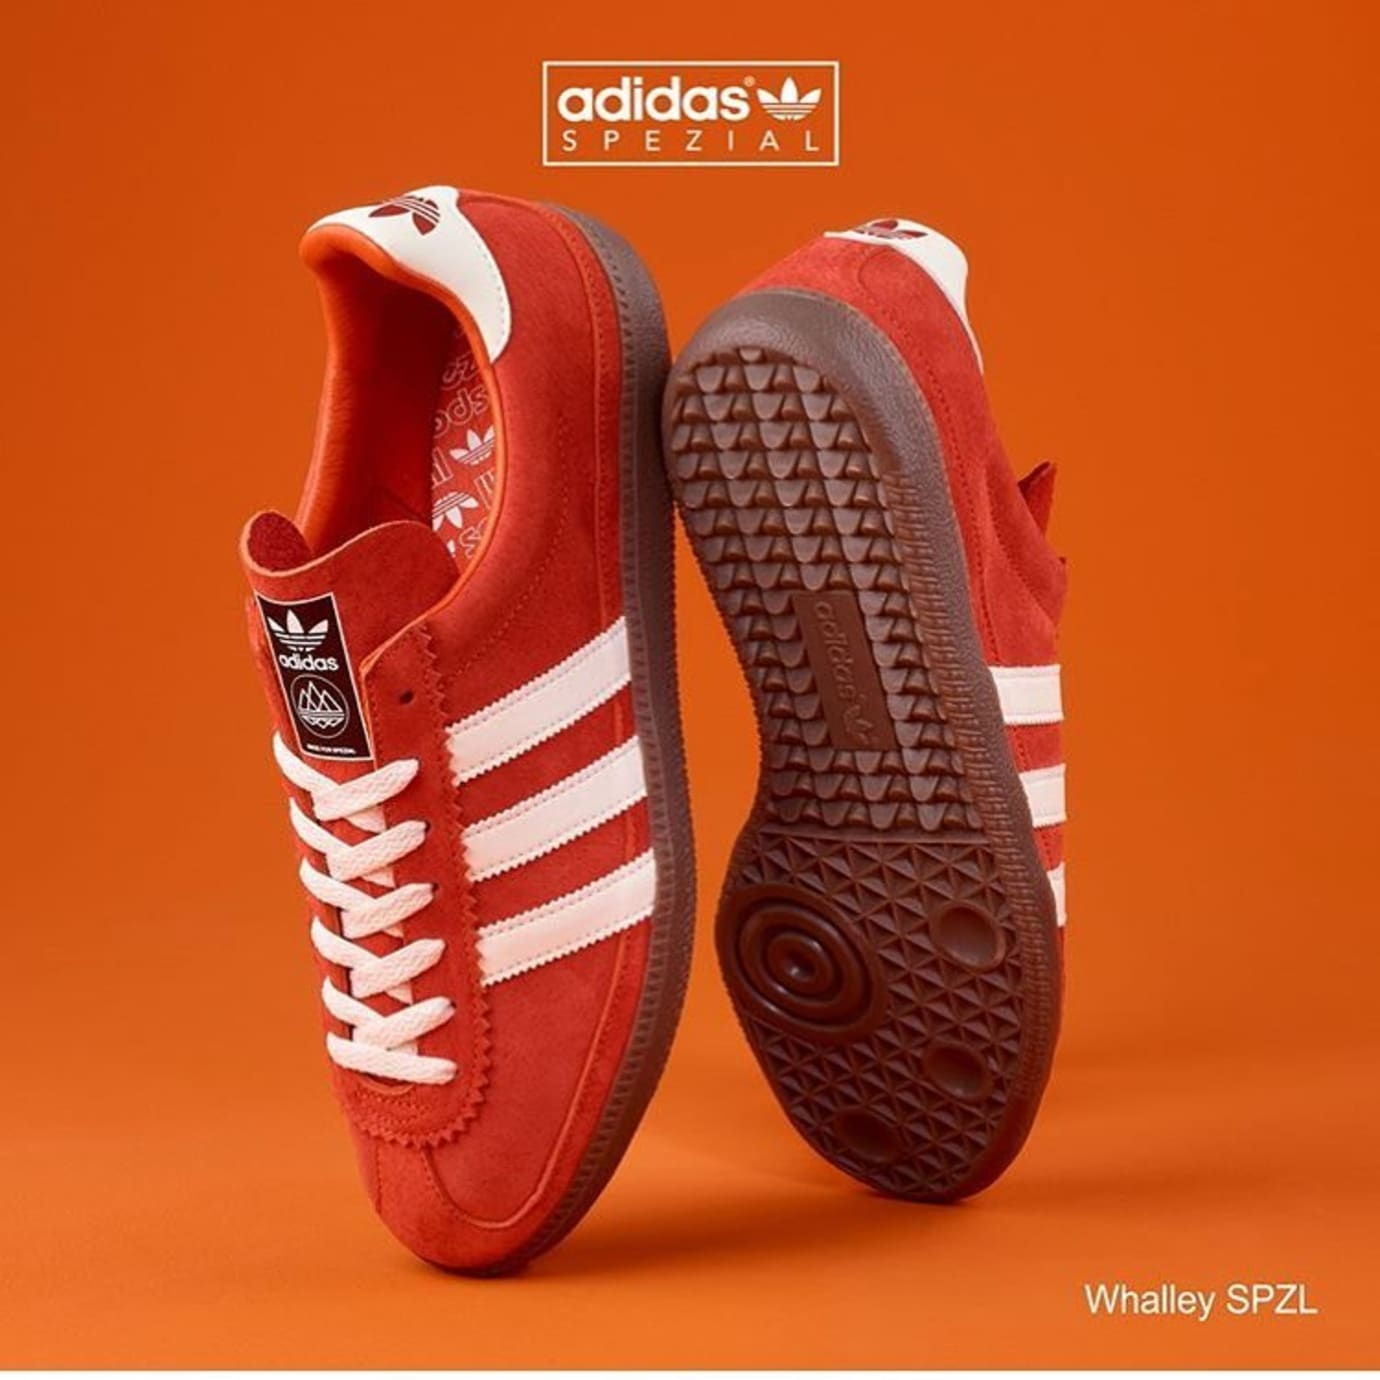 Adidas Spezial Printemps / Été 2019 Whalley